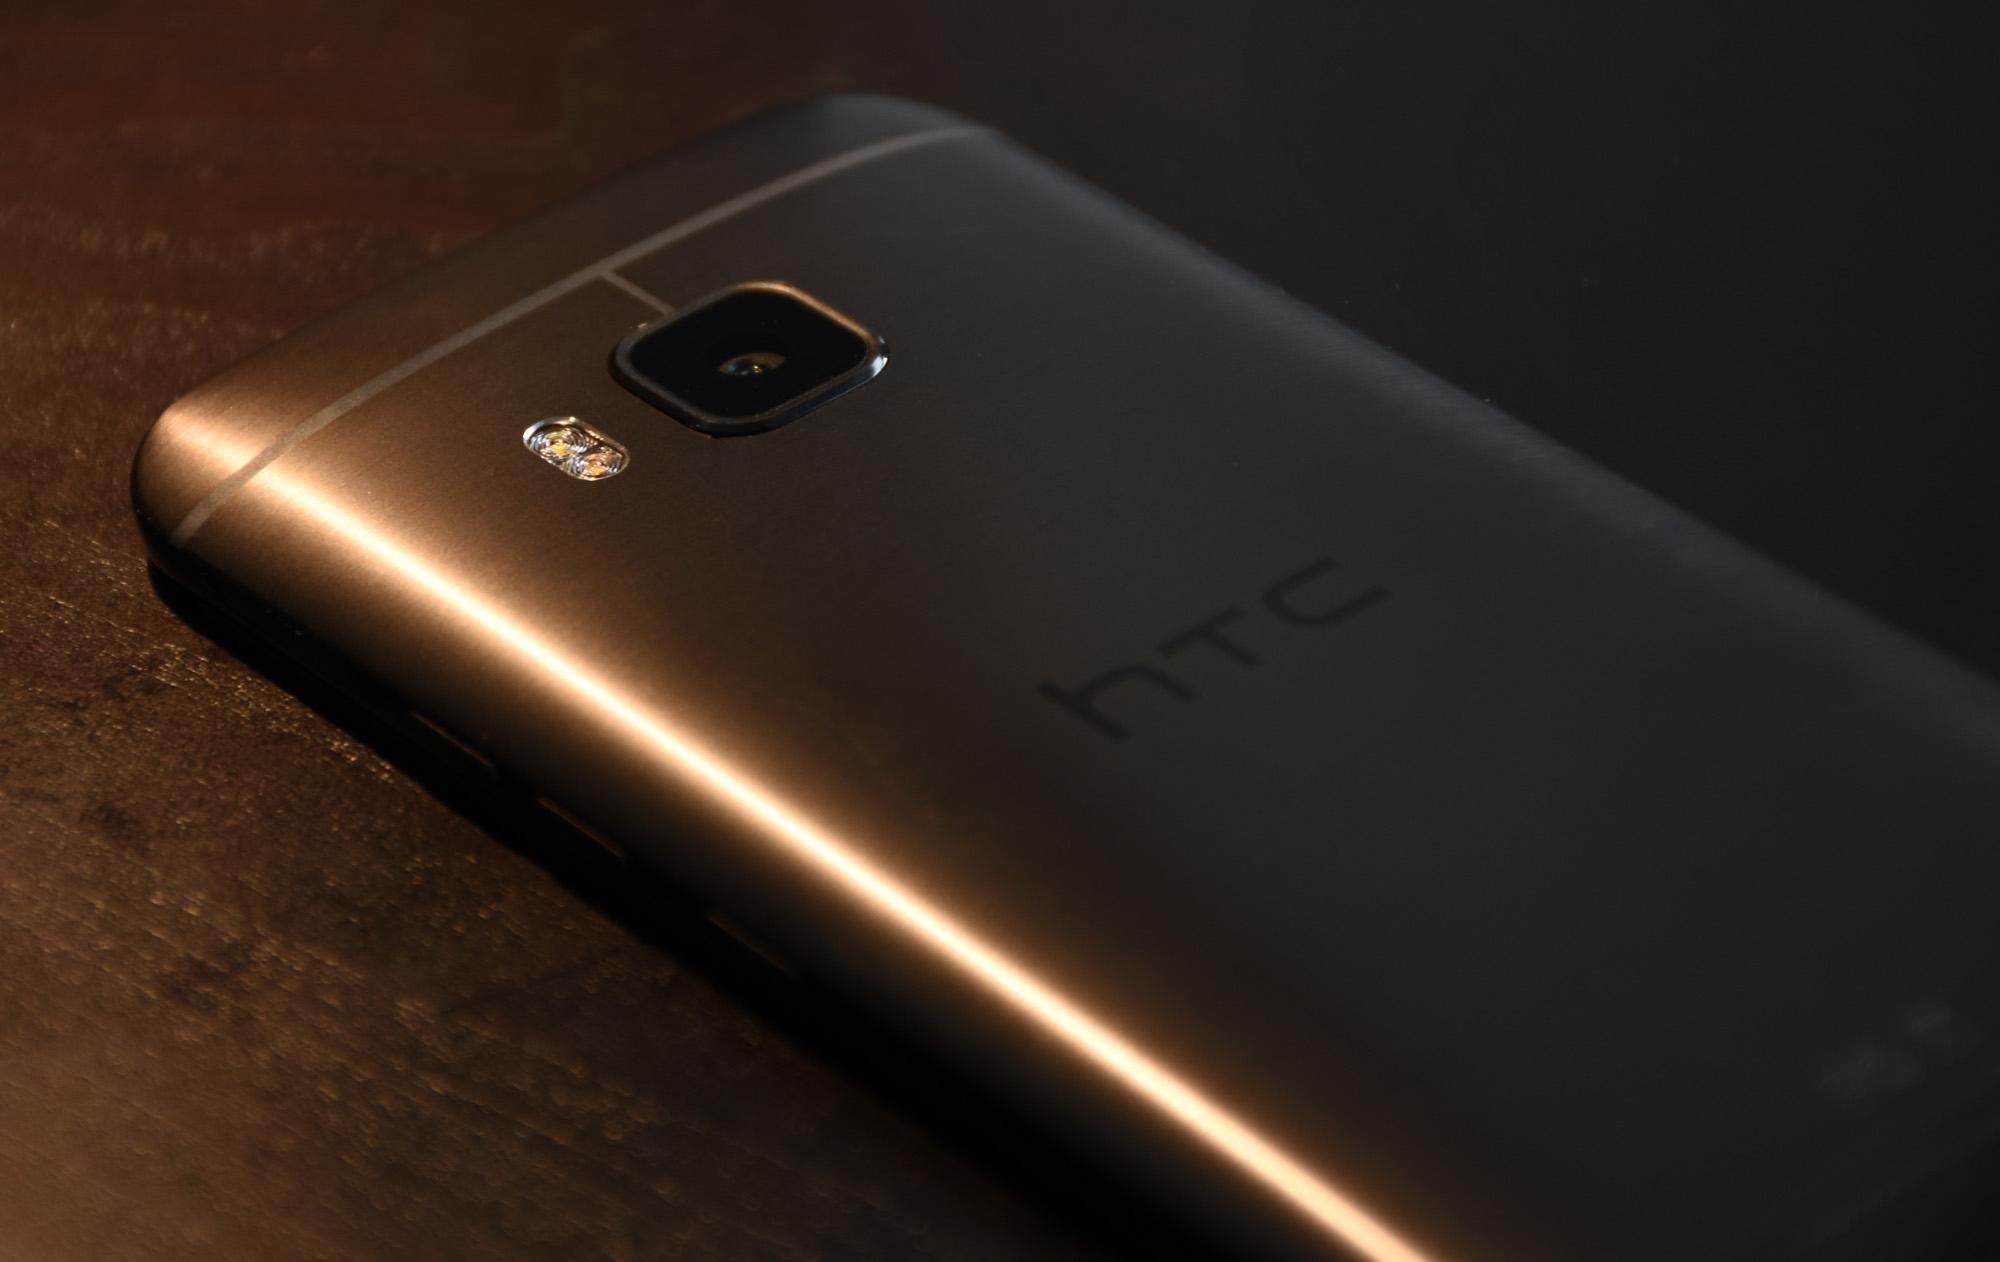 HTC One M9 laid down